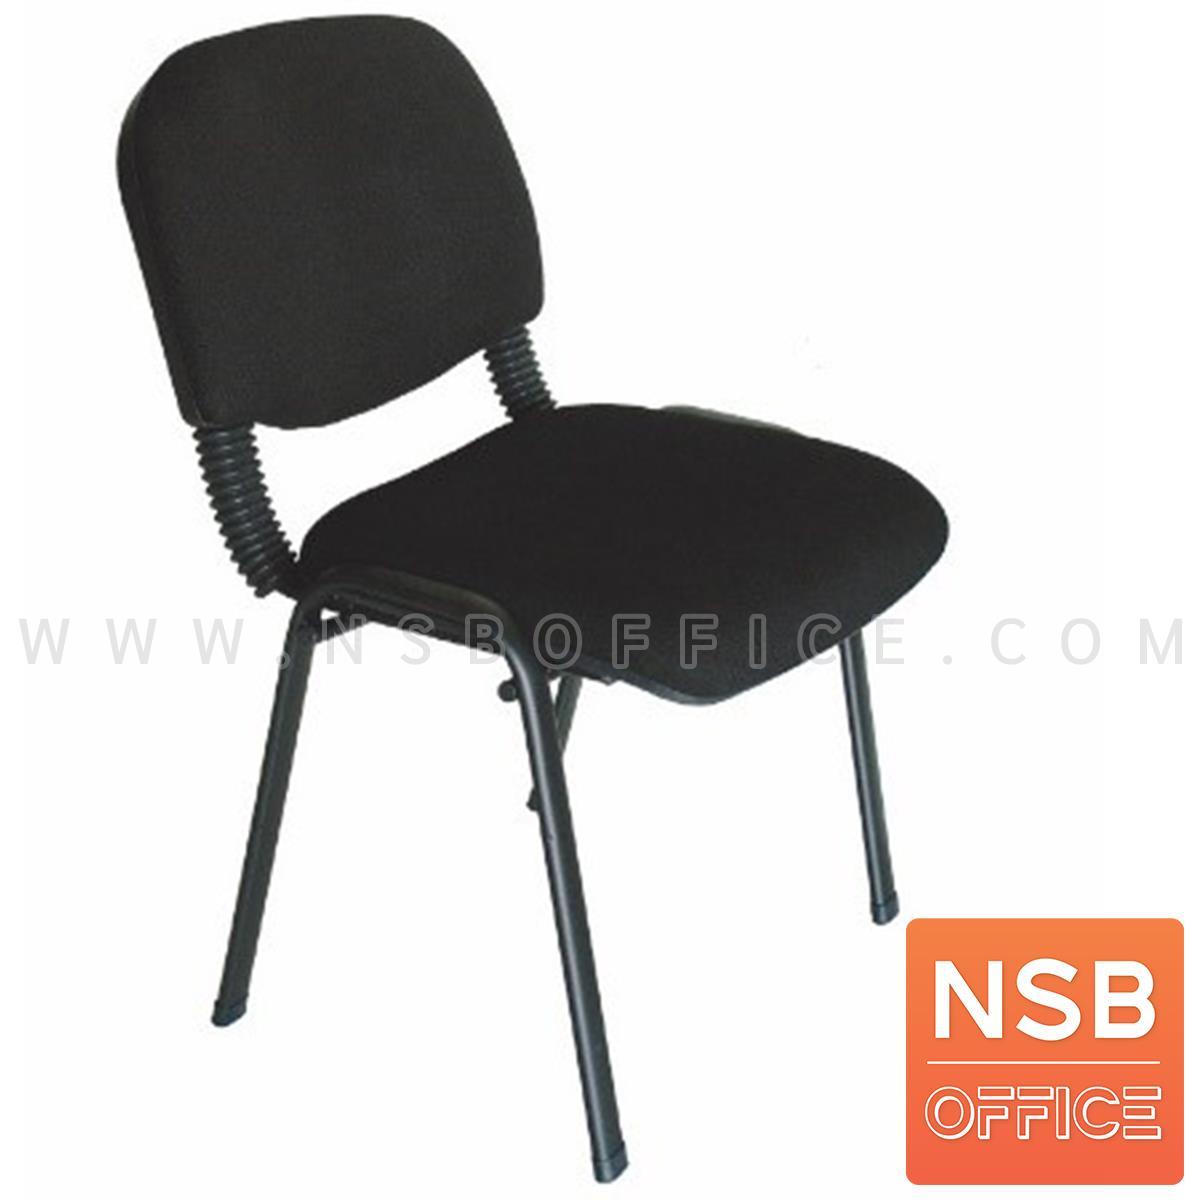 B08A090:เก้าอี้อเนกประสงค์ รุ่น Nectec  ขาเหล็กพ่นดำ